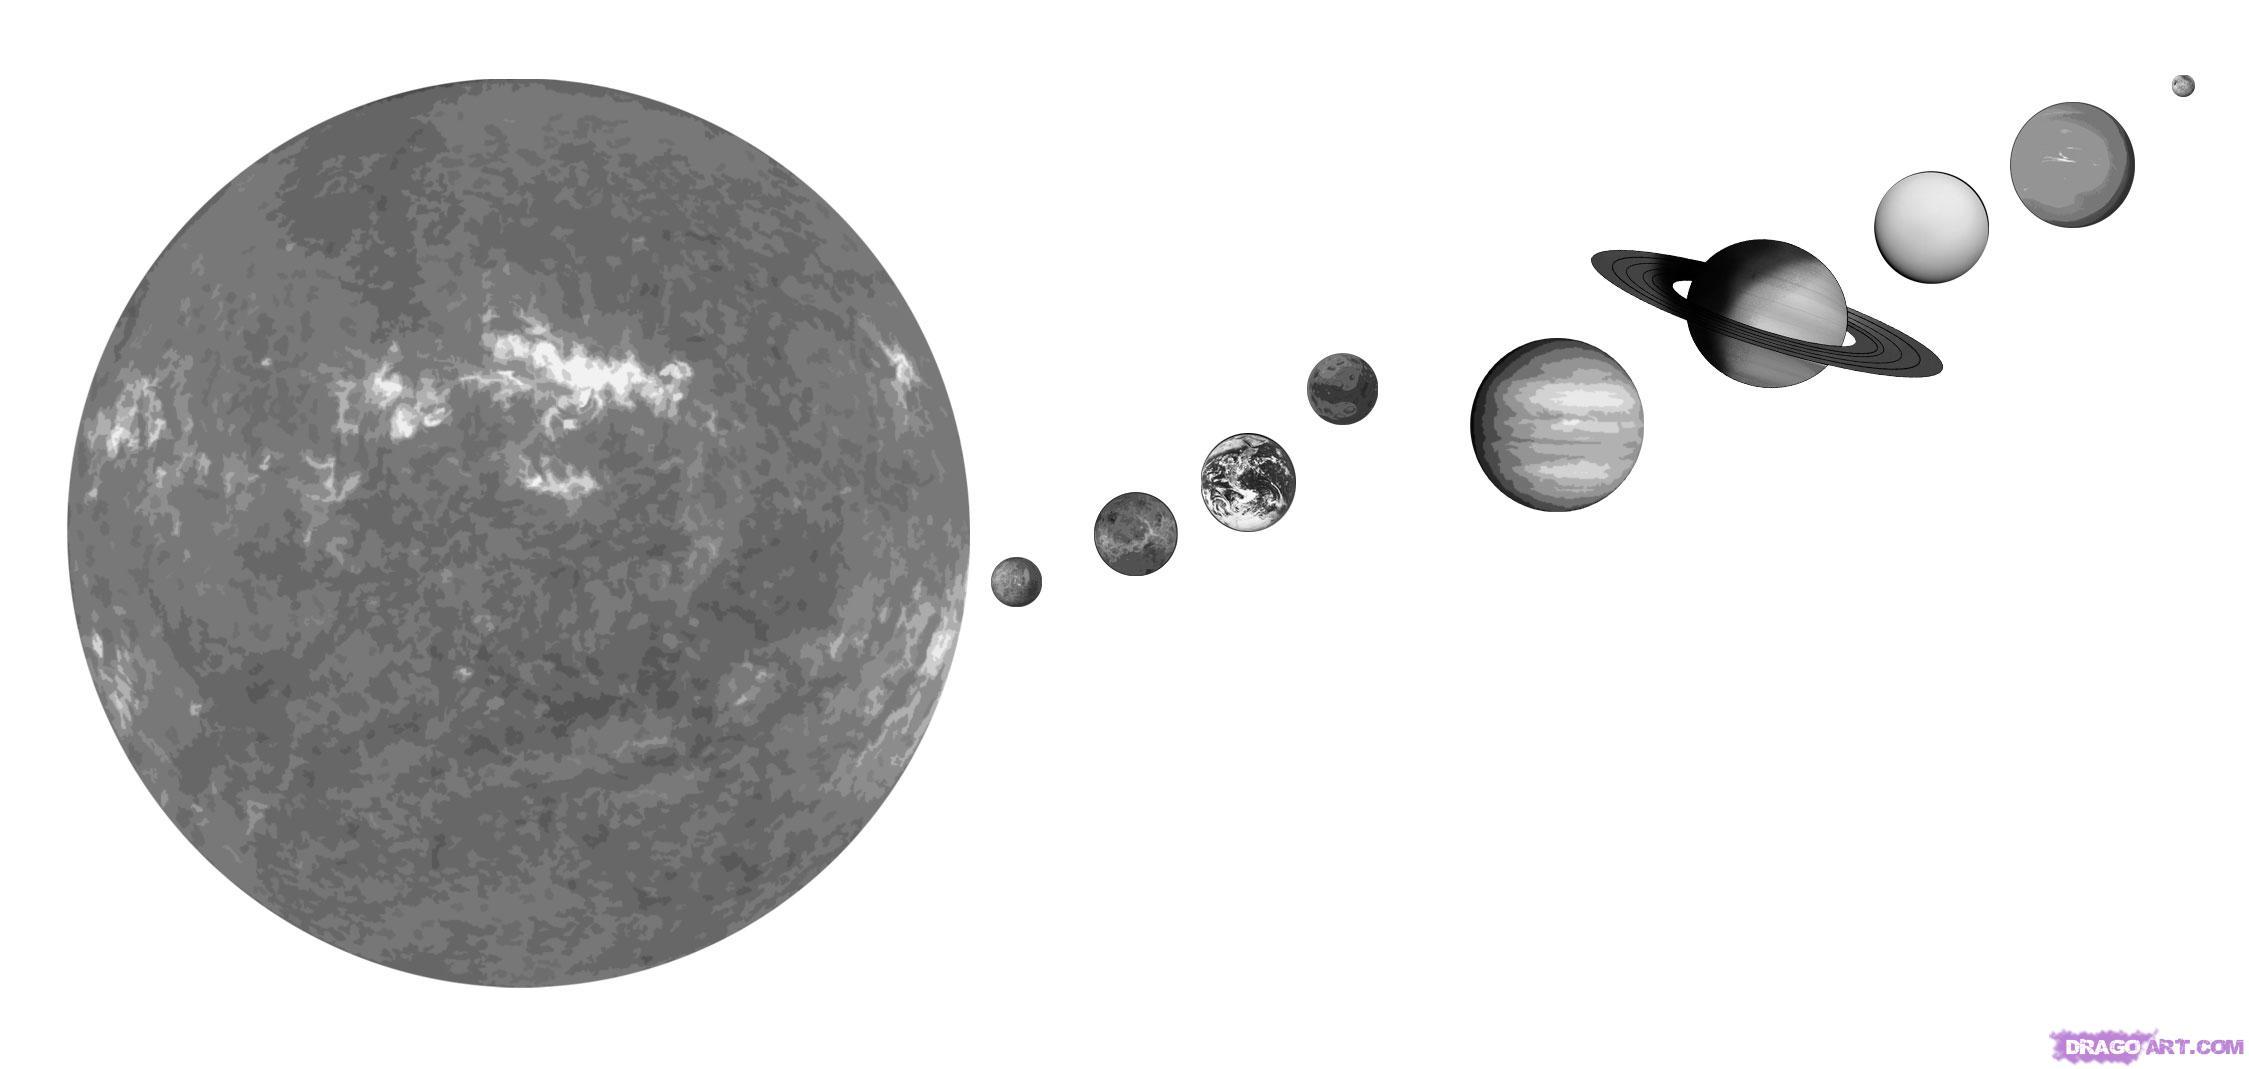 Drawn planets world map globe Landmarks How to Solar Step